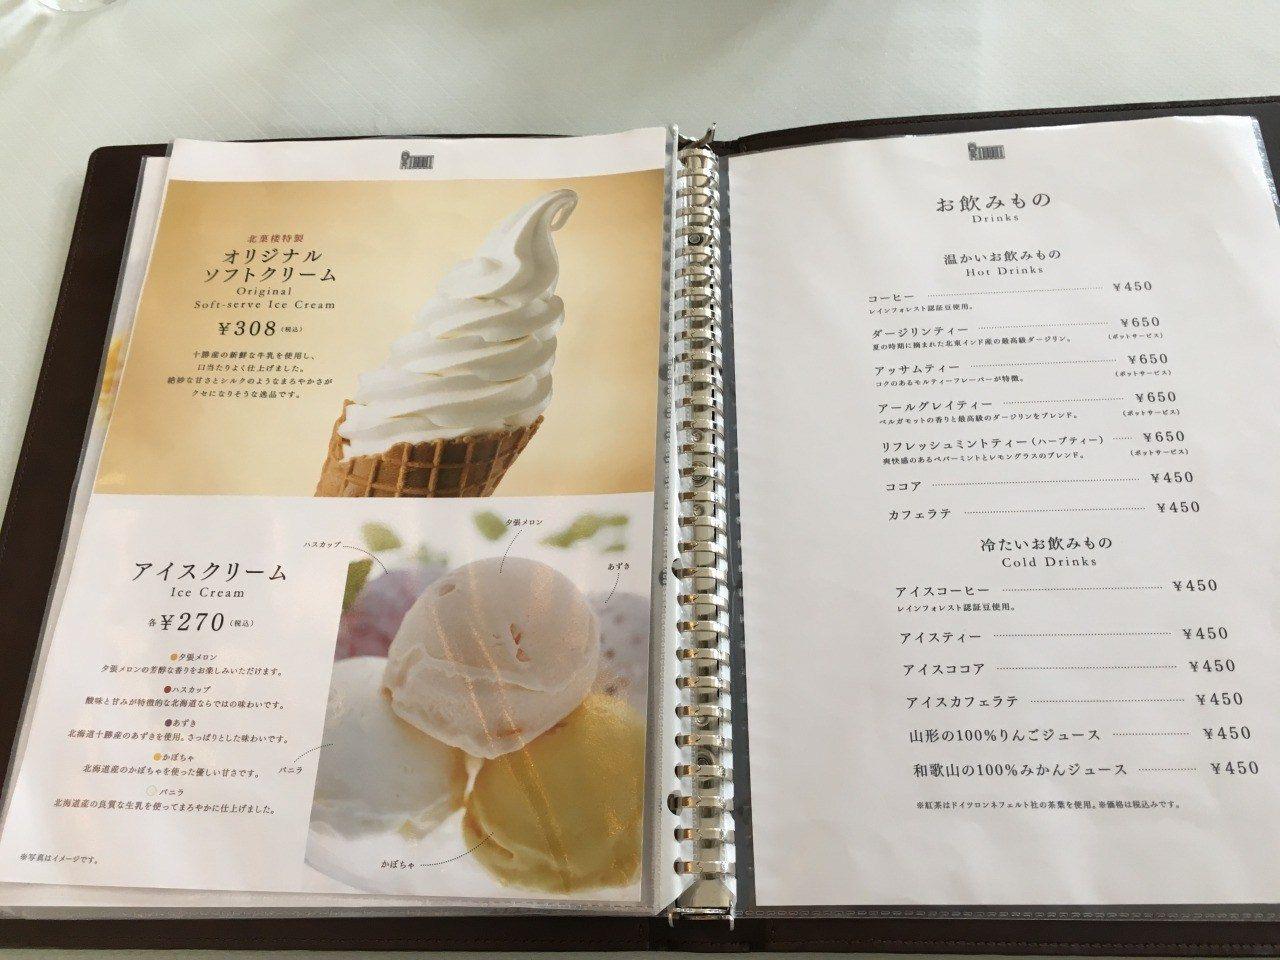 Original soft serve ice cream (308 yen)